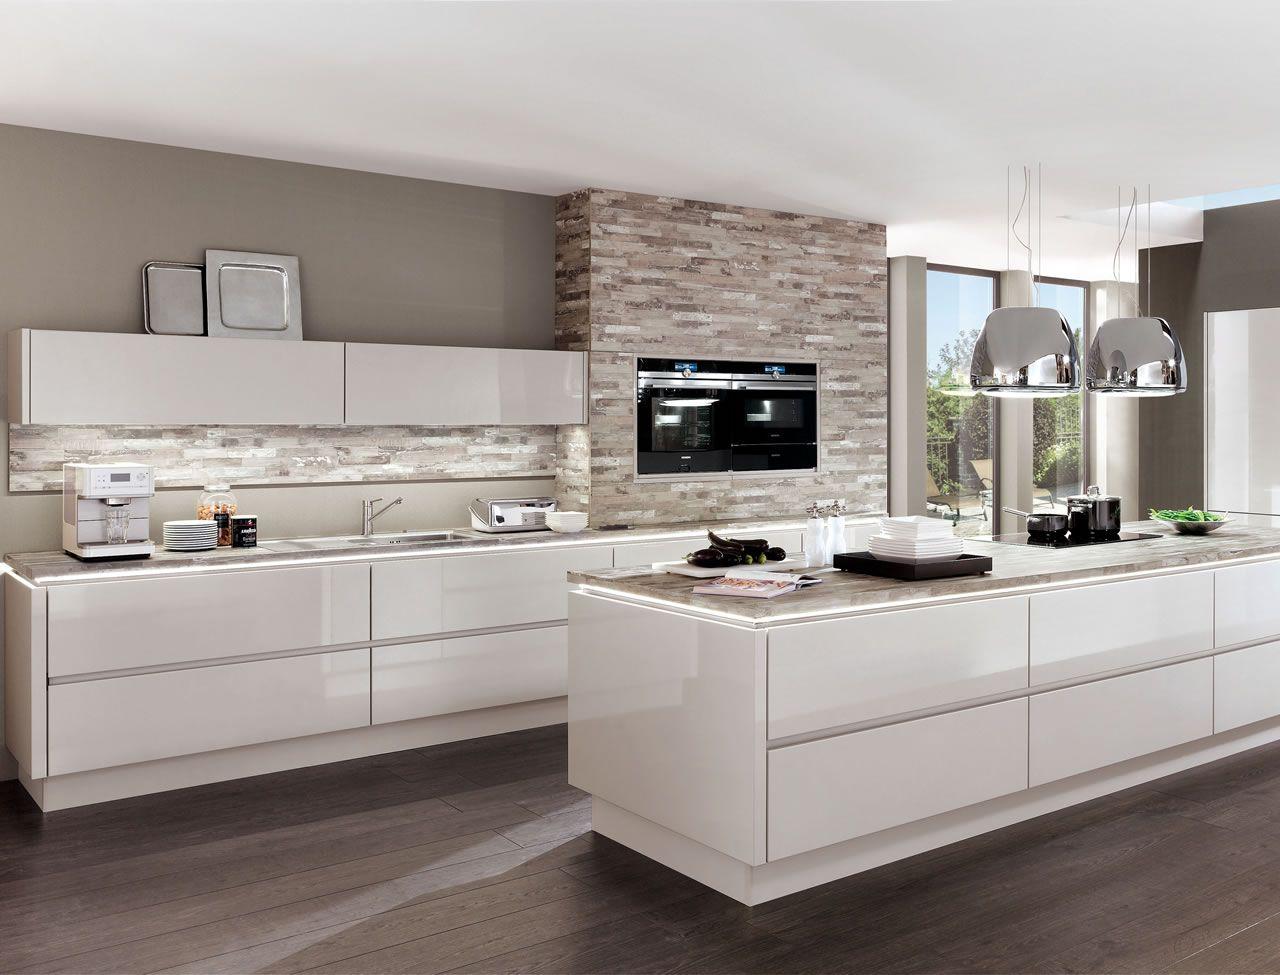 Kitchen Collections   Home kitchens, Nobilia kitchen, Modern ...